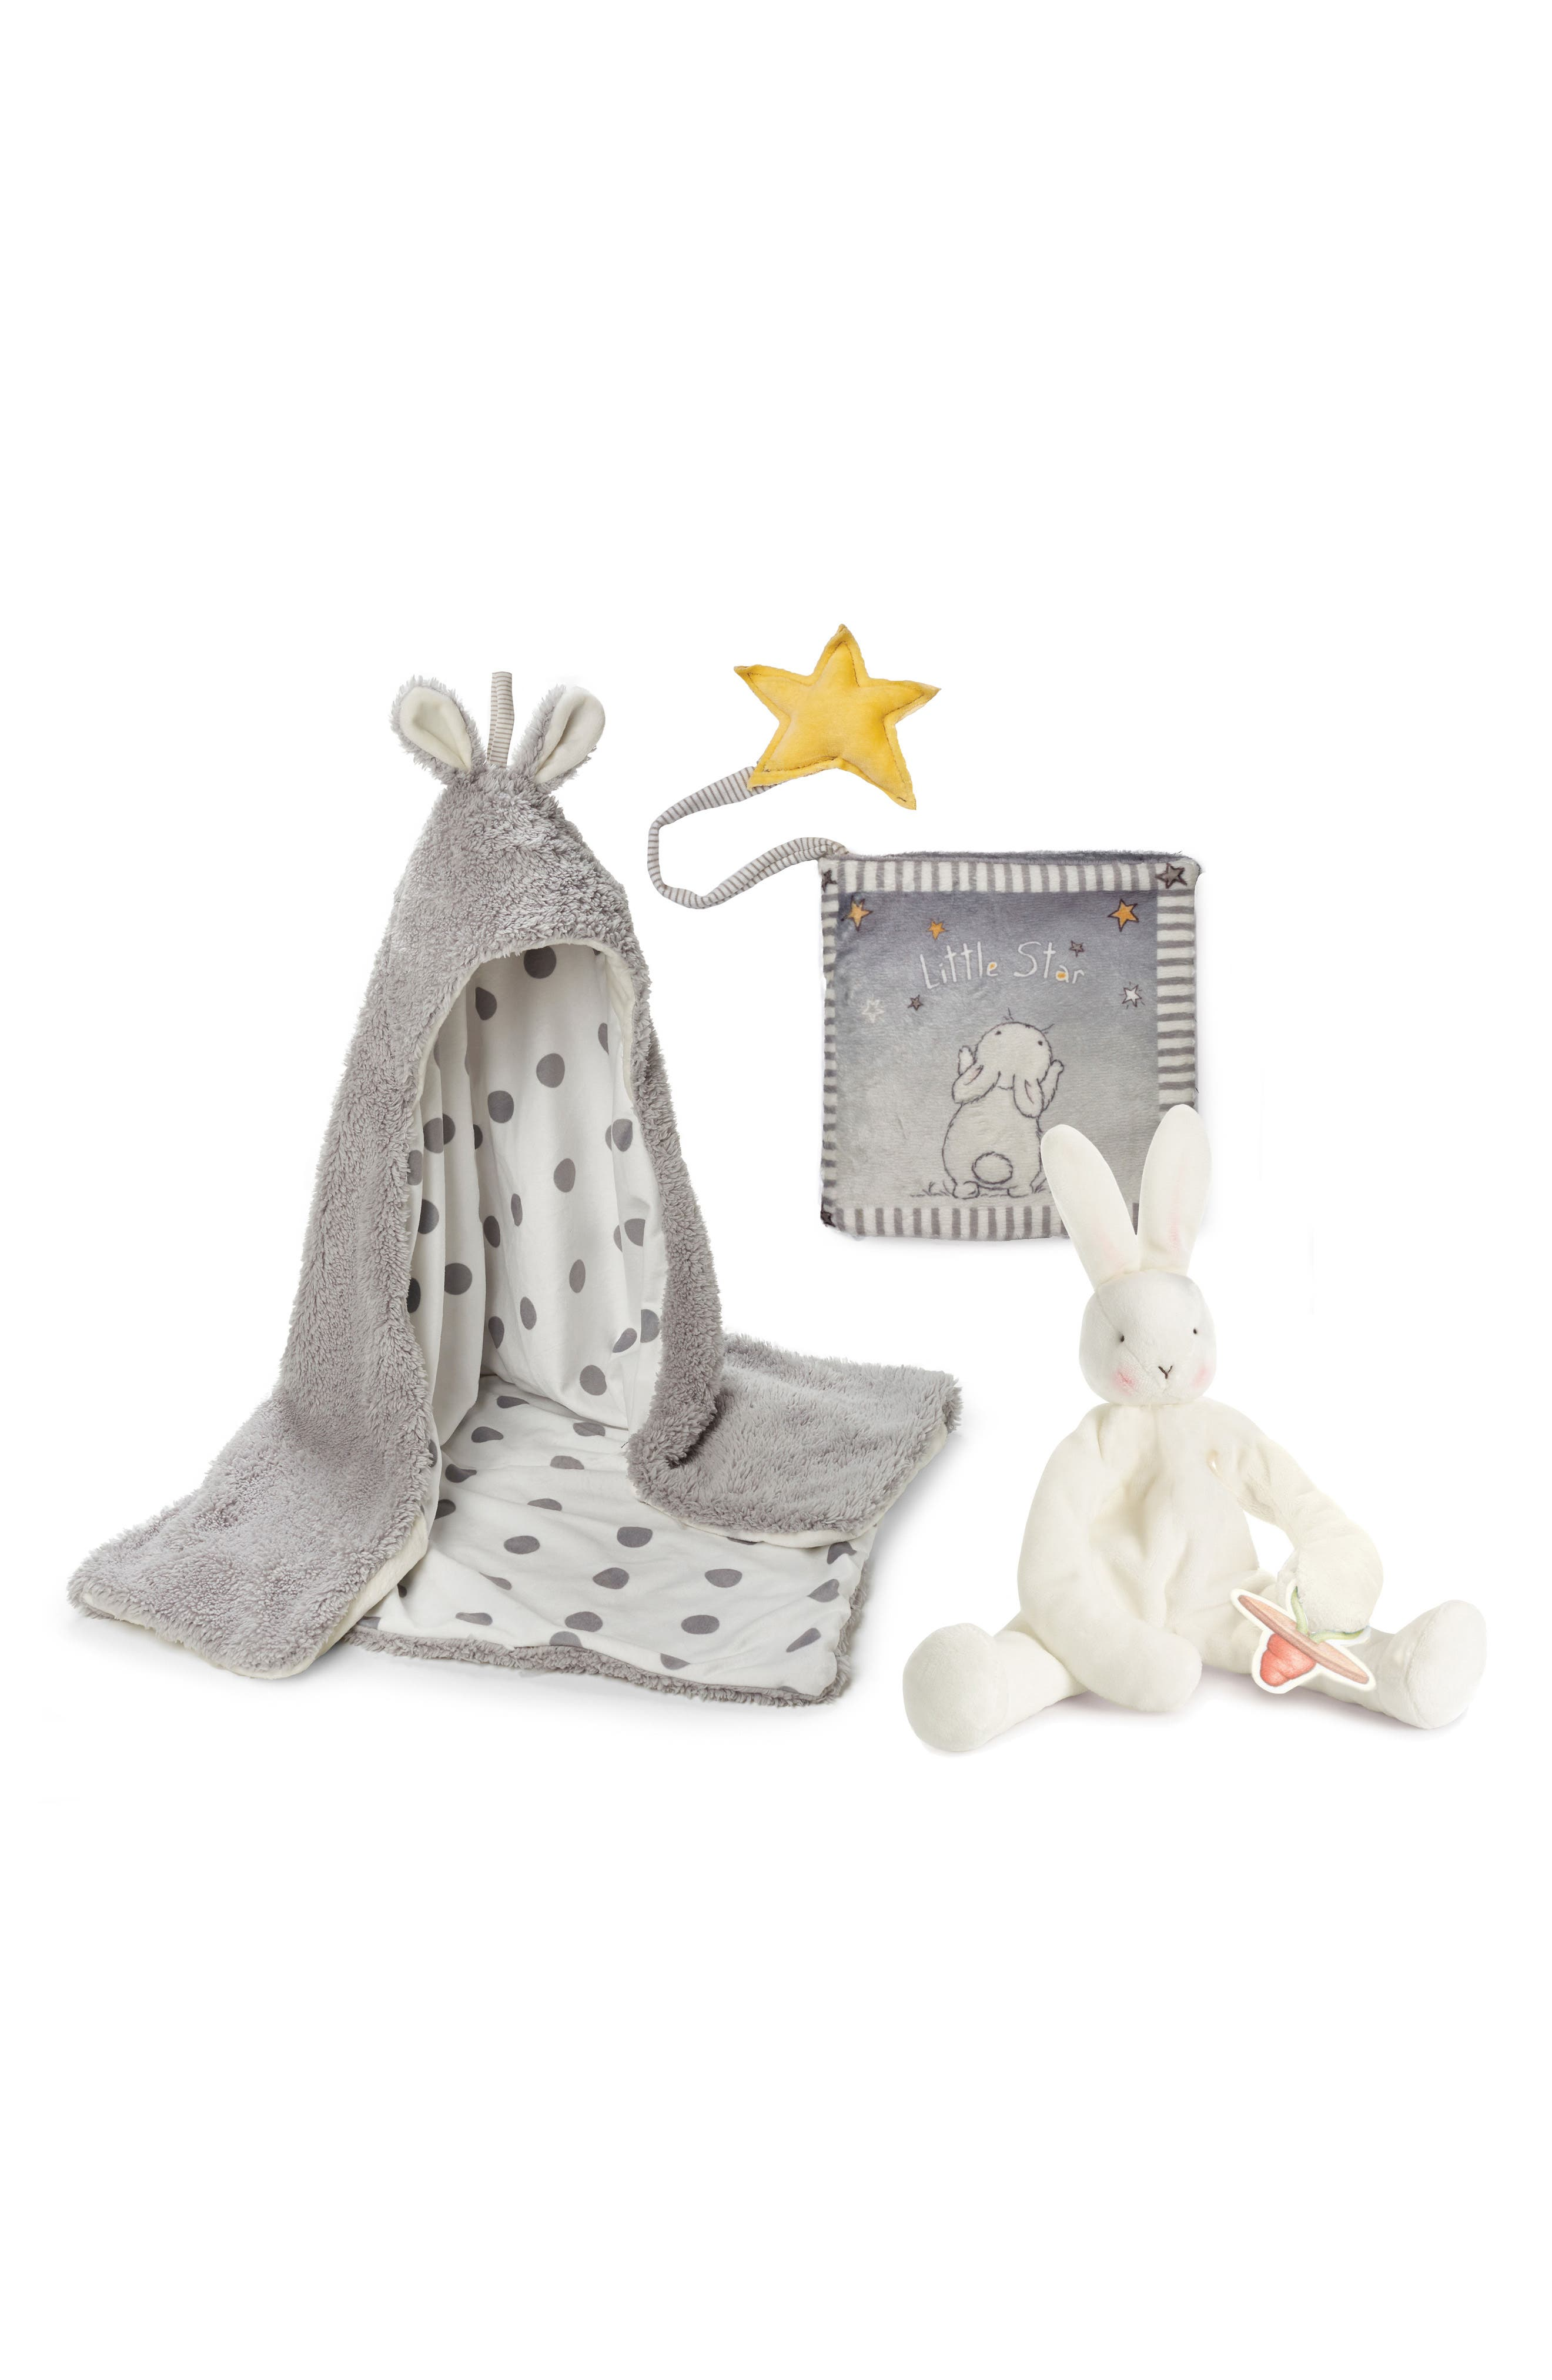 Storytime Hooded Blanket, Stuffed Animal & Book Set,                         Main,                         color,